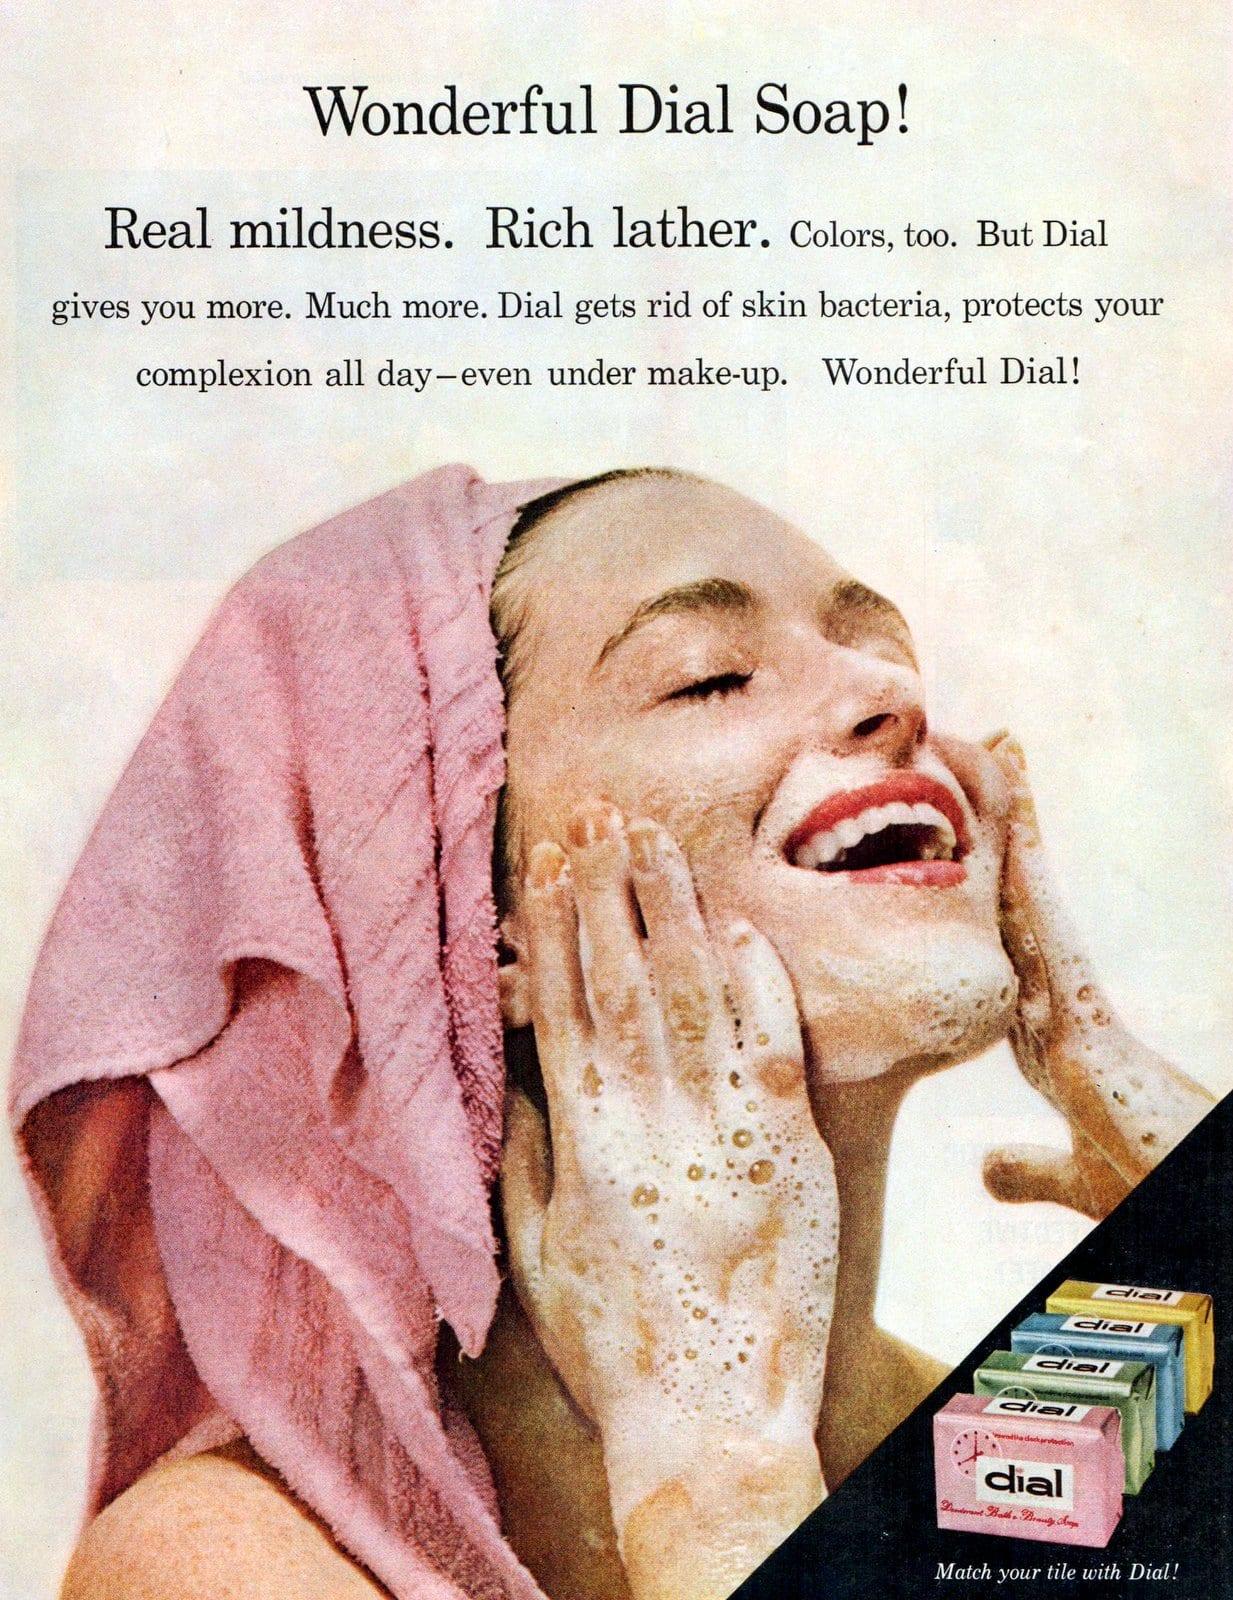 Wonderful dial soap - Vintage 1958